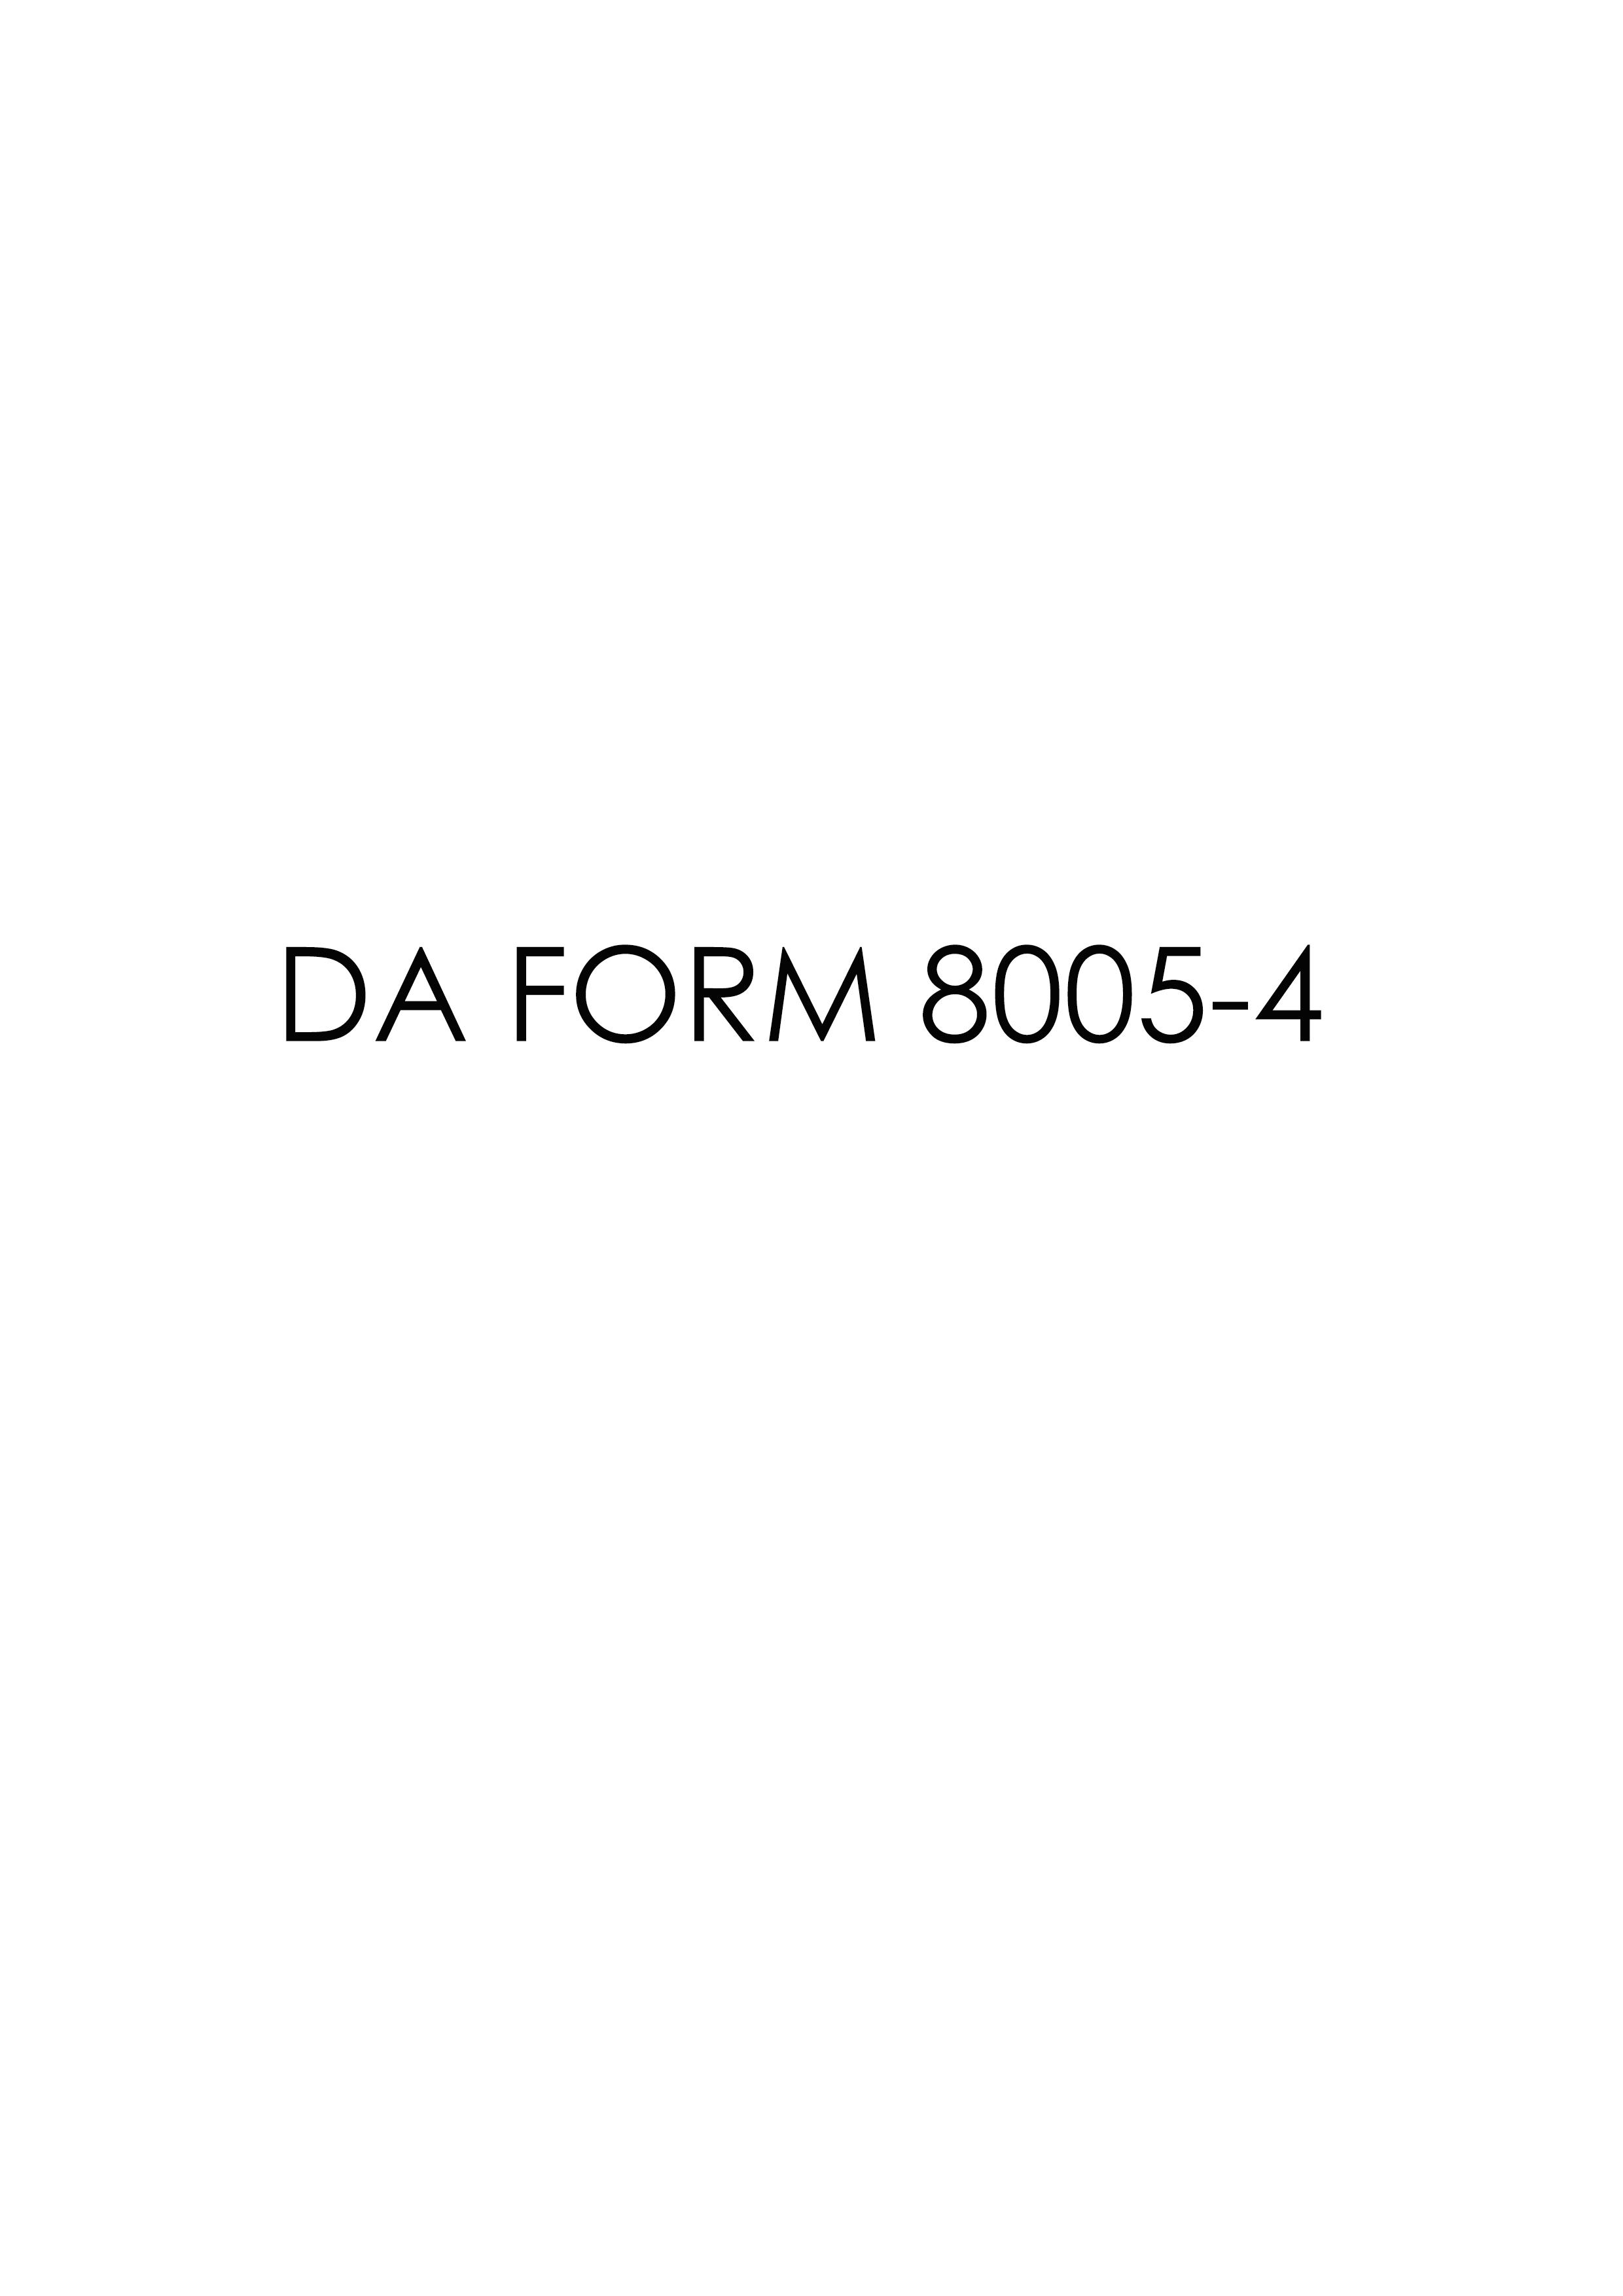 Download da Form 8005-4 Free